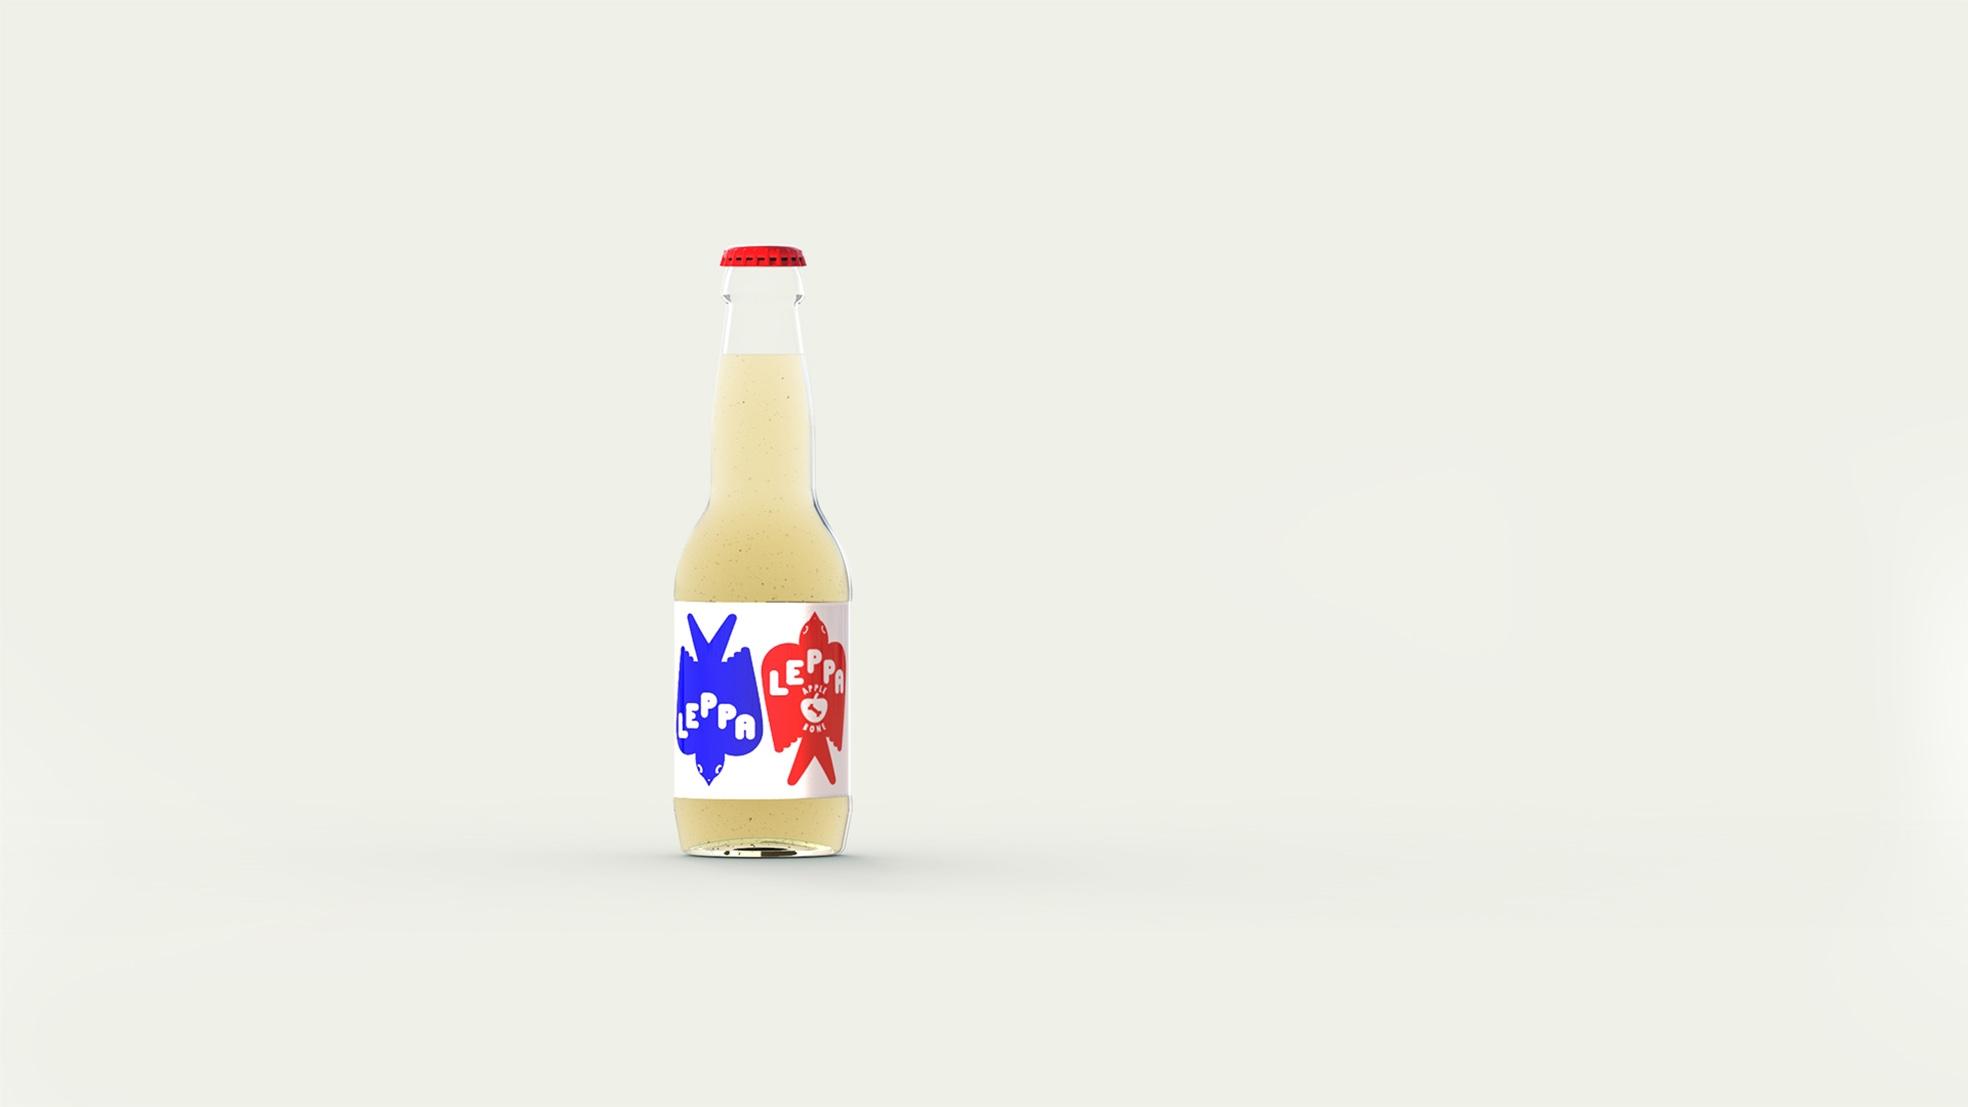 Leppa Productshot